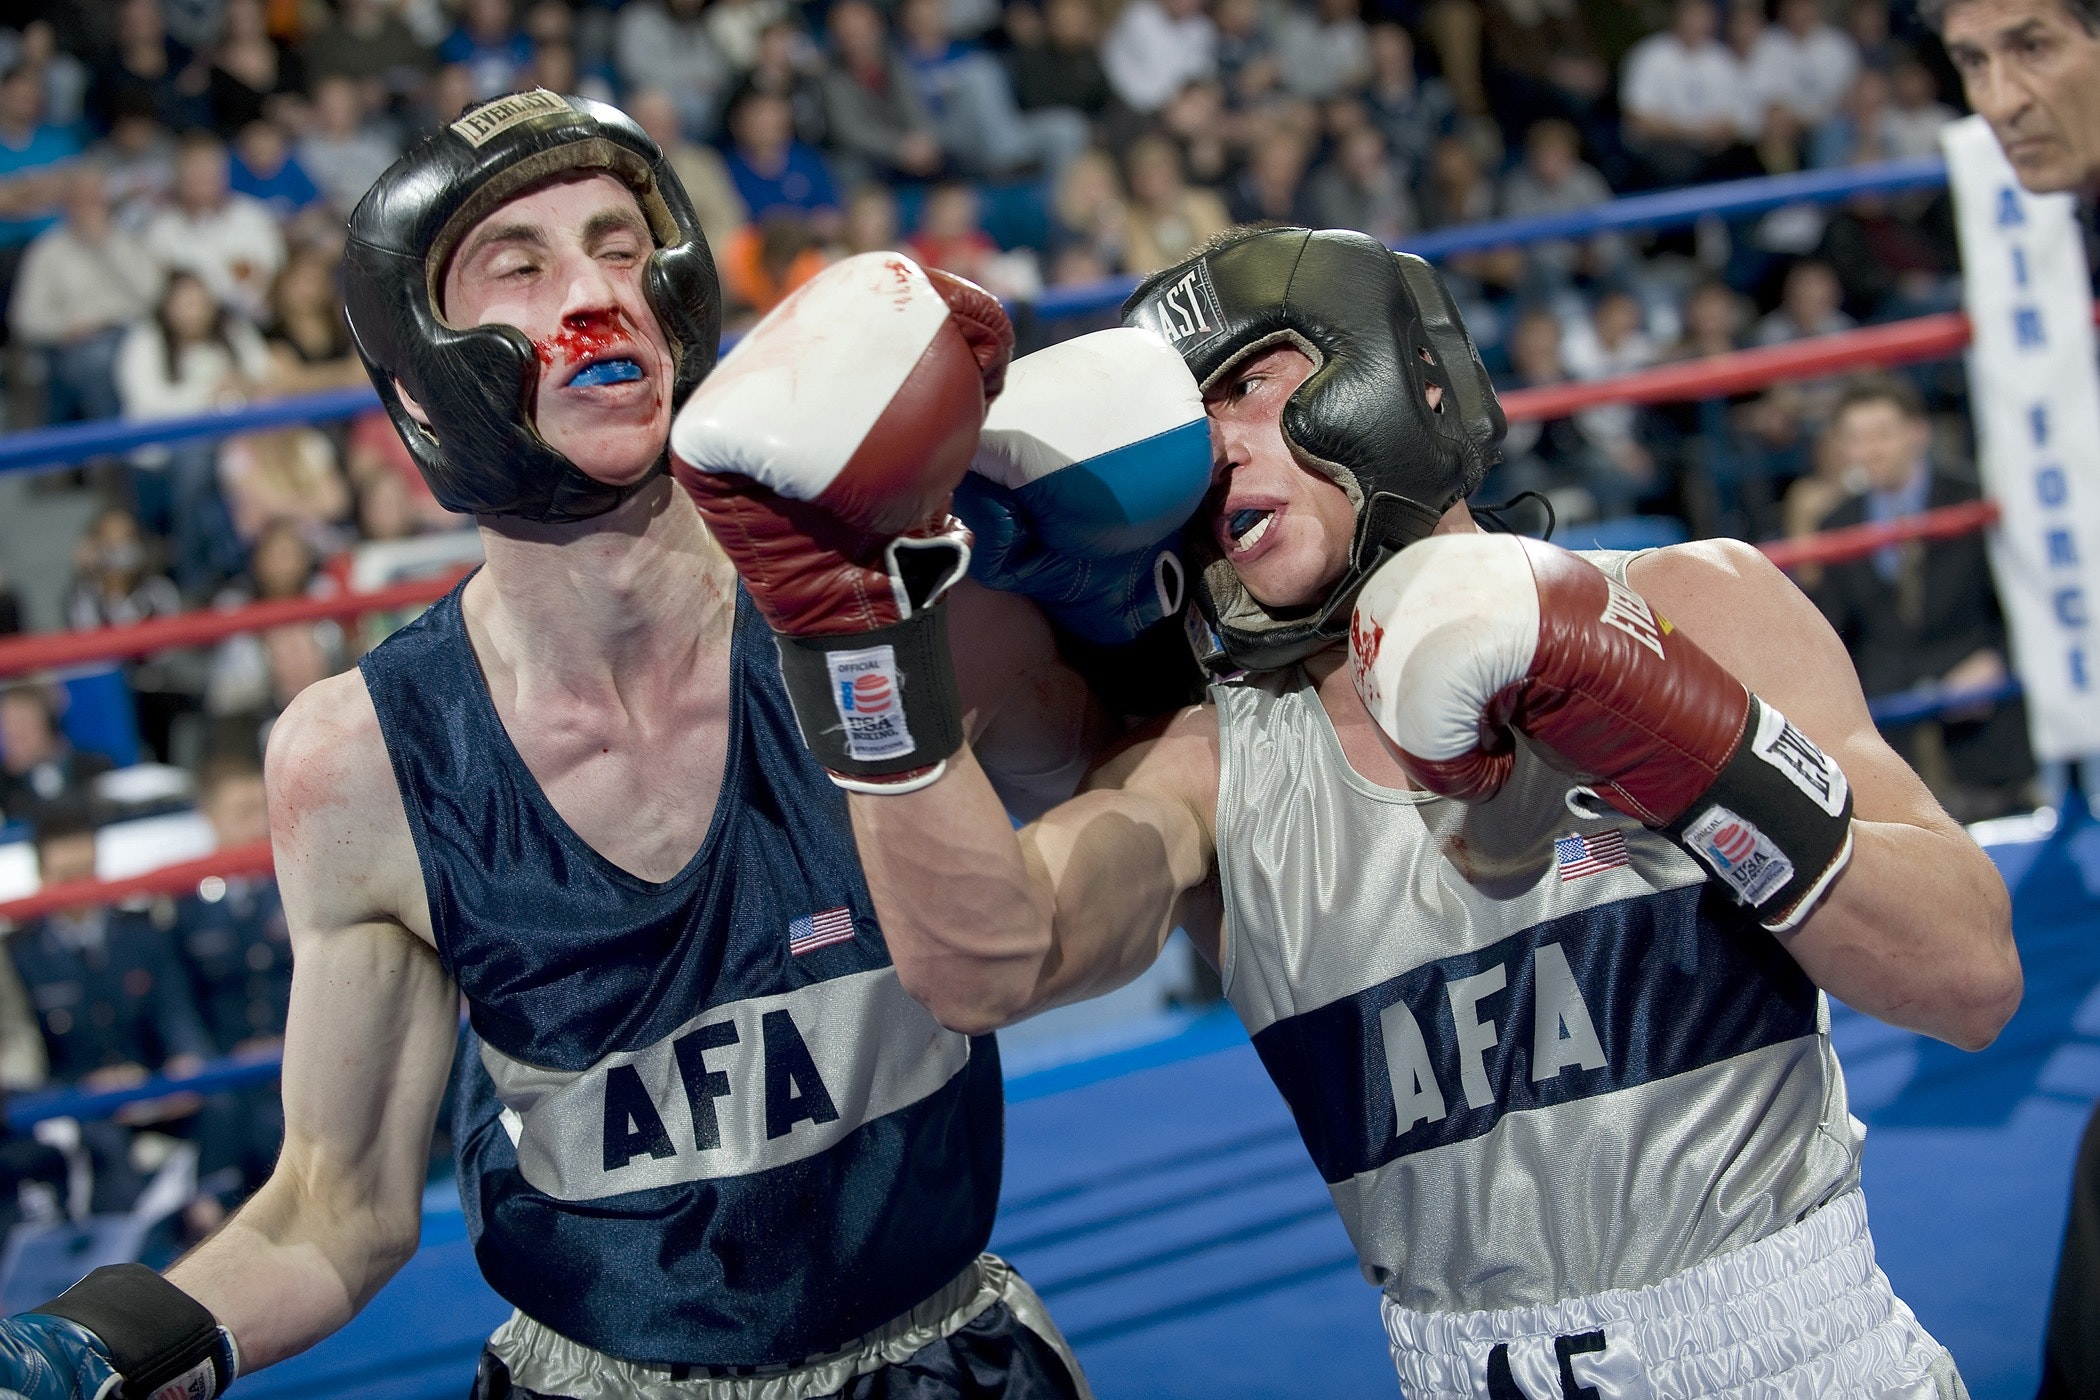 afa-athlete-blood-70567